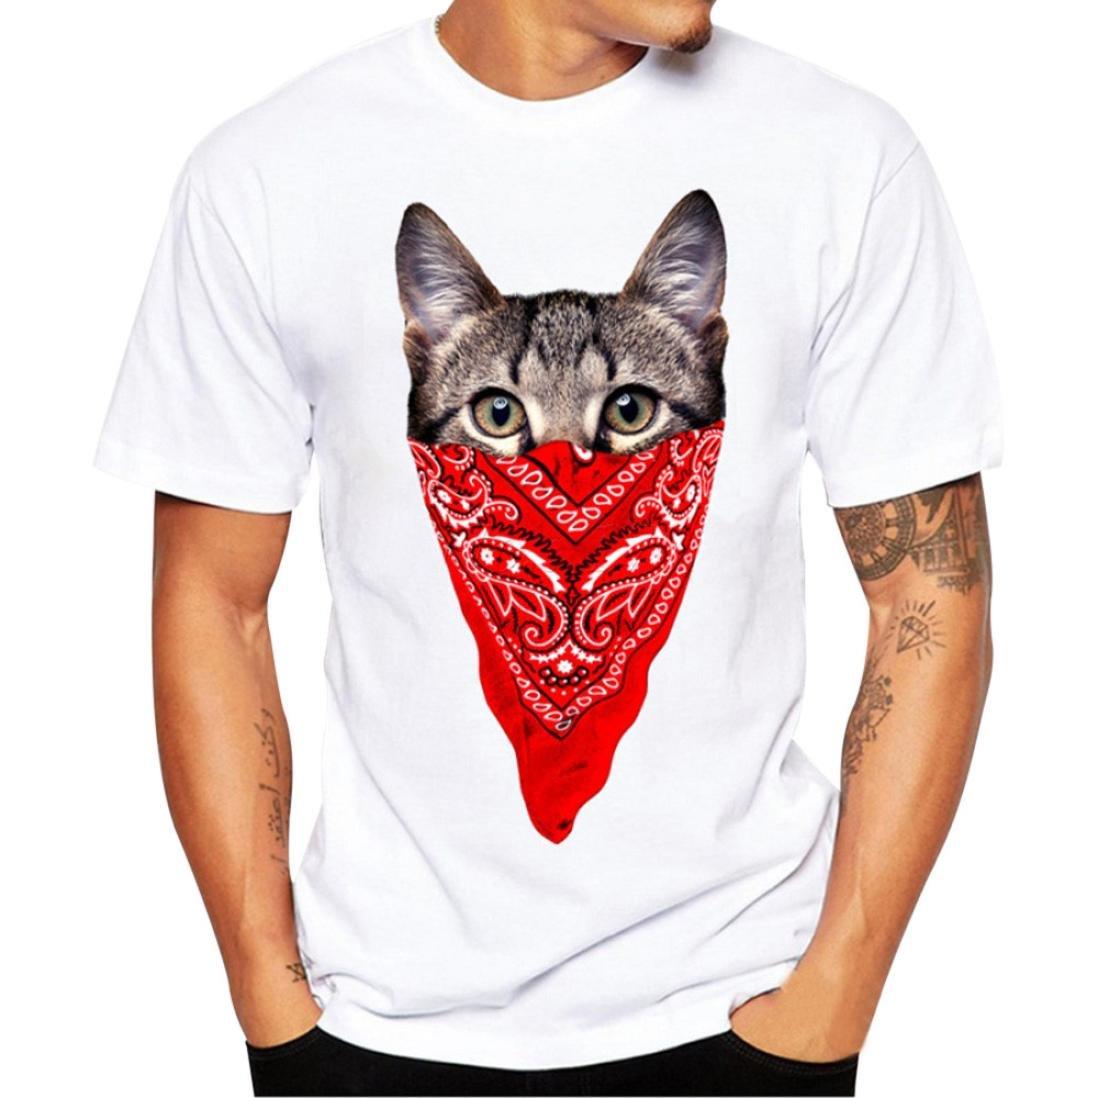 Zulmaliu Men Tee Shirt, Cute Cat Print T-Shirt Polo Shirts Short Sleeve Outfit Cool Tank Tops